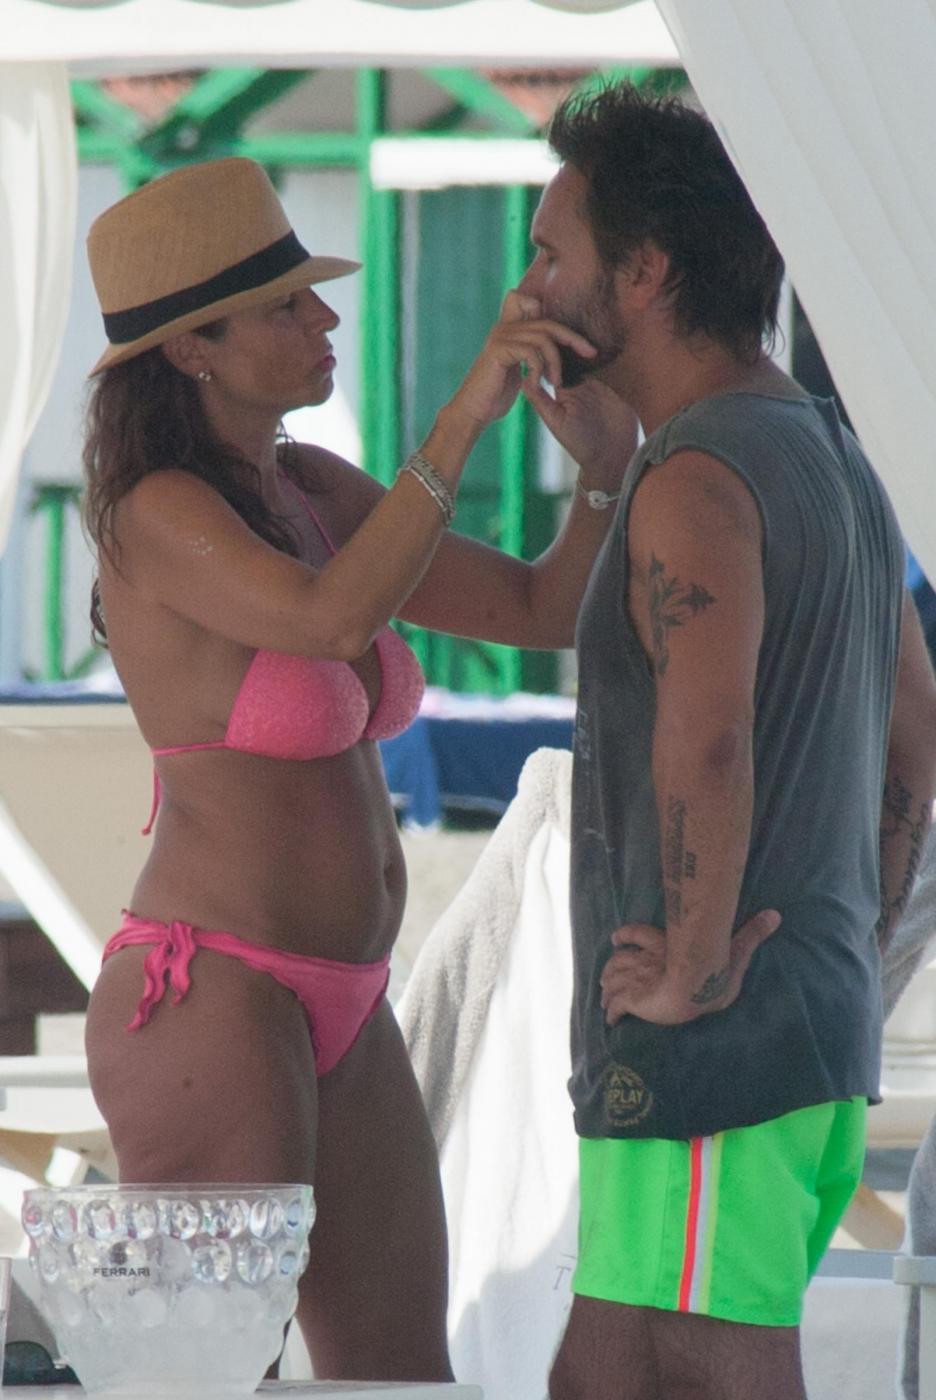 Nek e la moglie Patrizia Vacondio a Marina di Pietrasanta FOTO 14